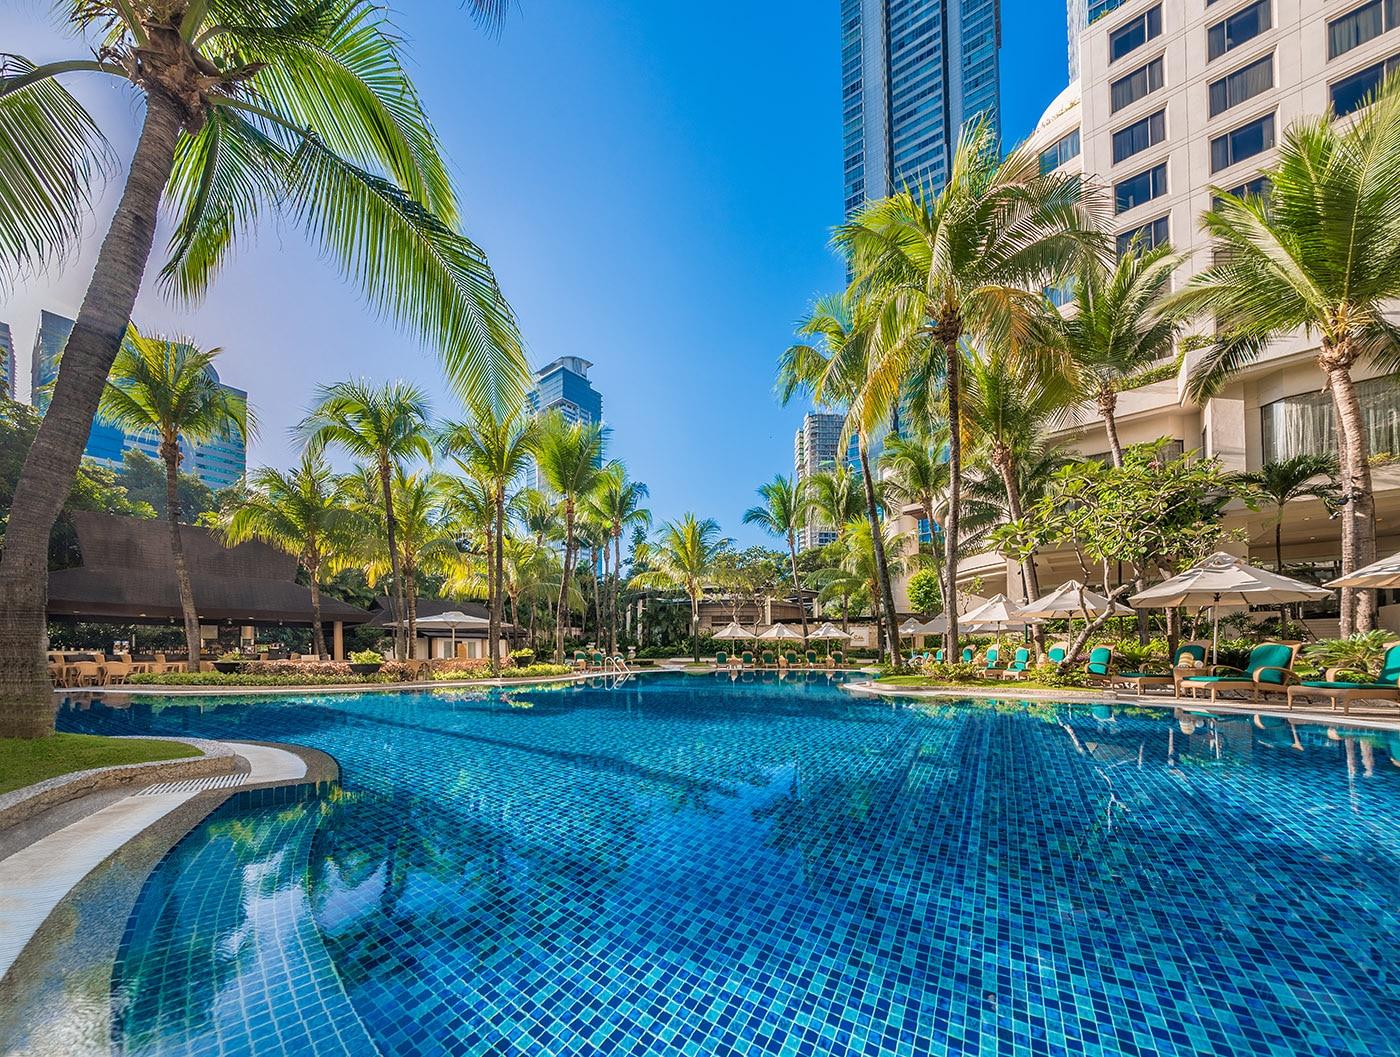 Check out of Shangri-La EDSA Hotel